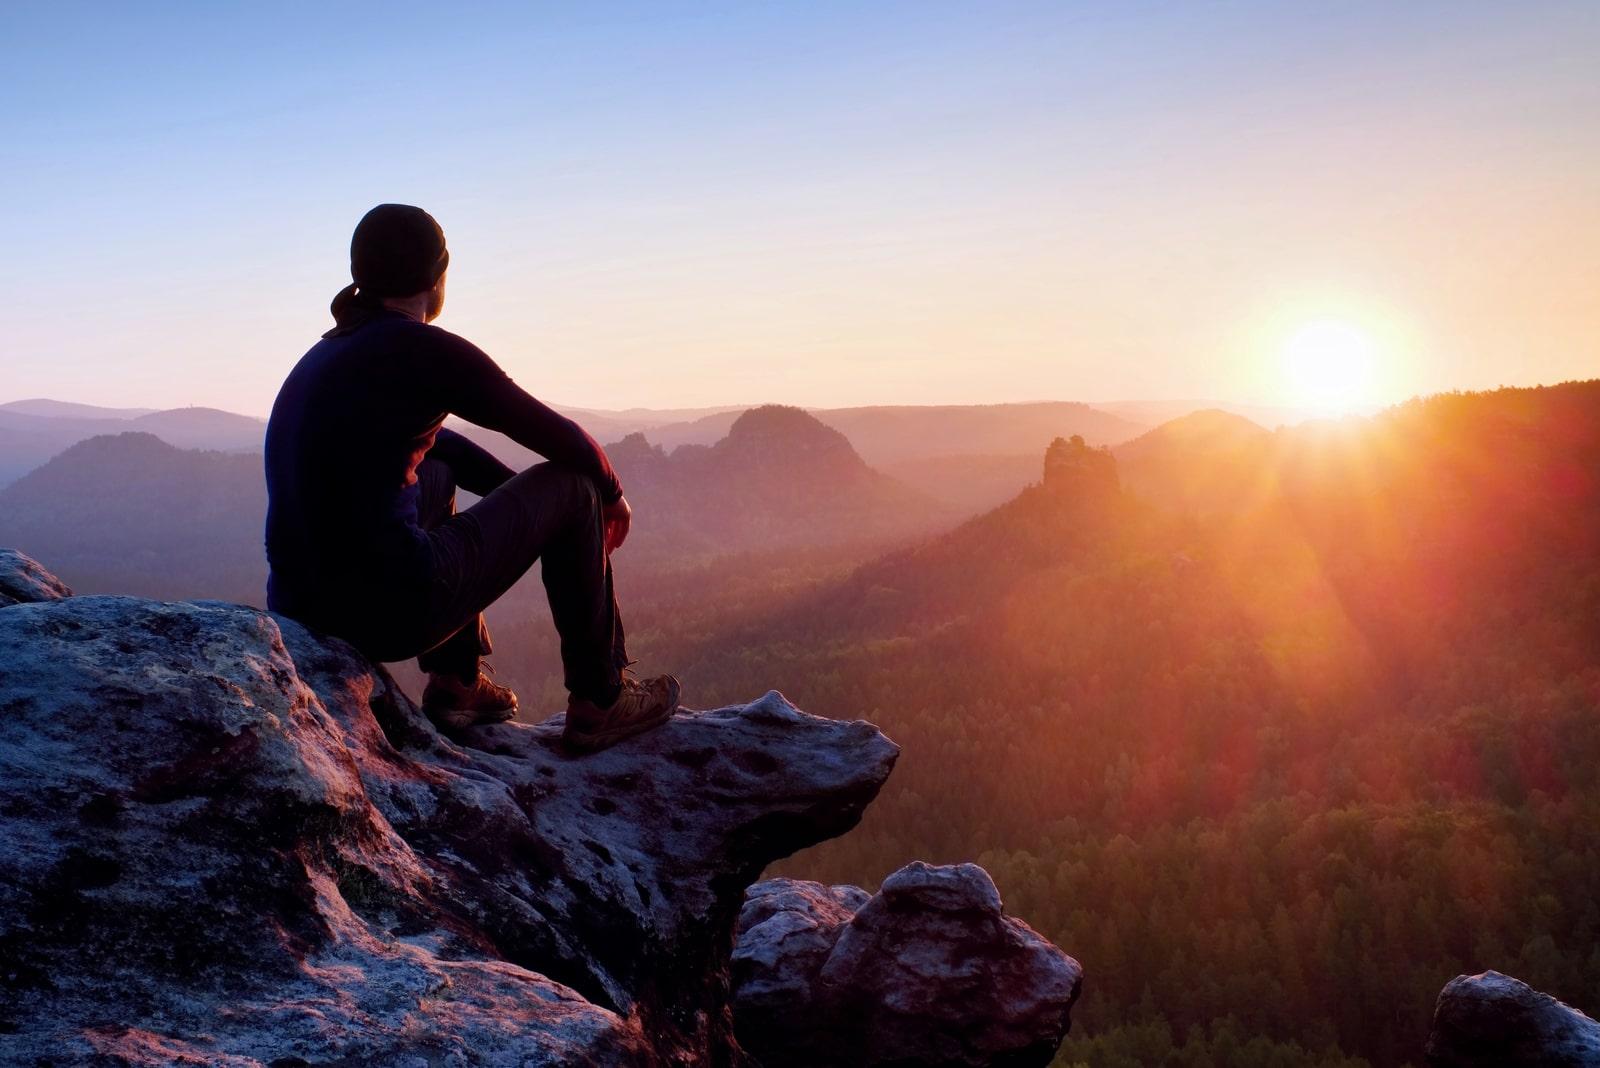 a man sitting on a rock